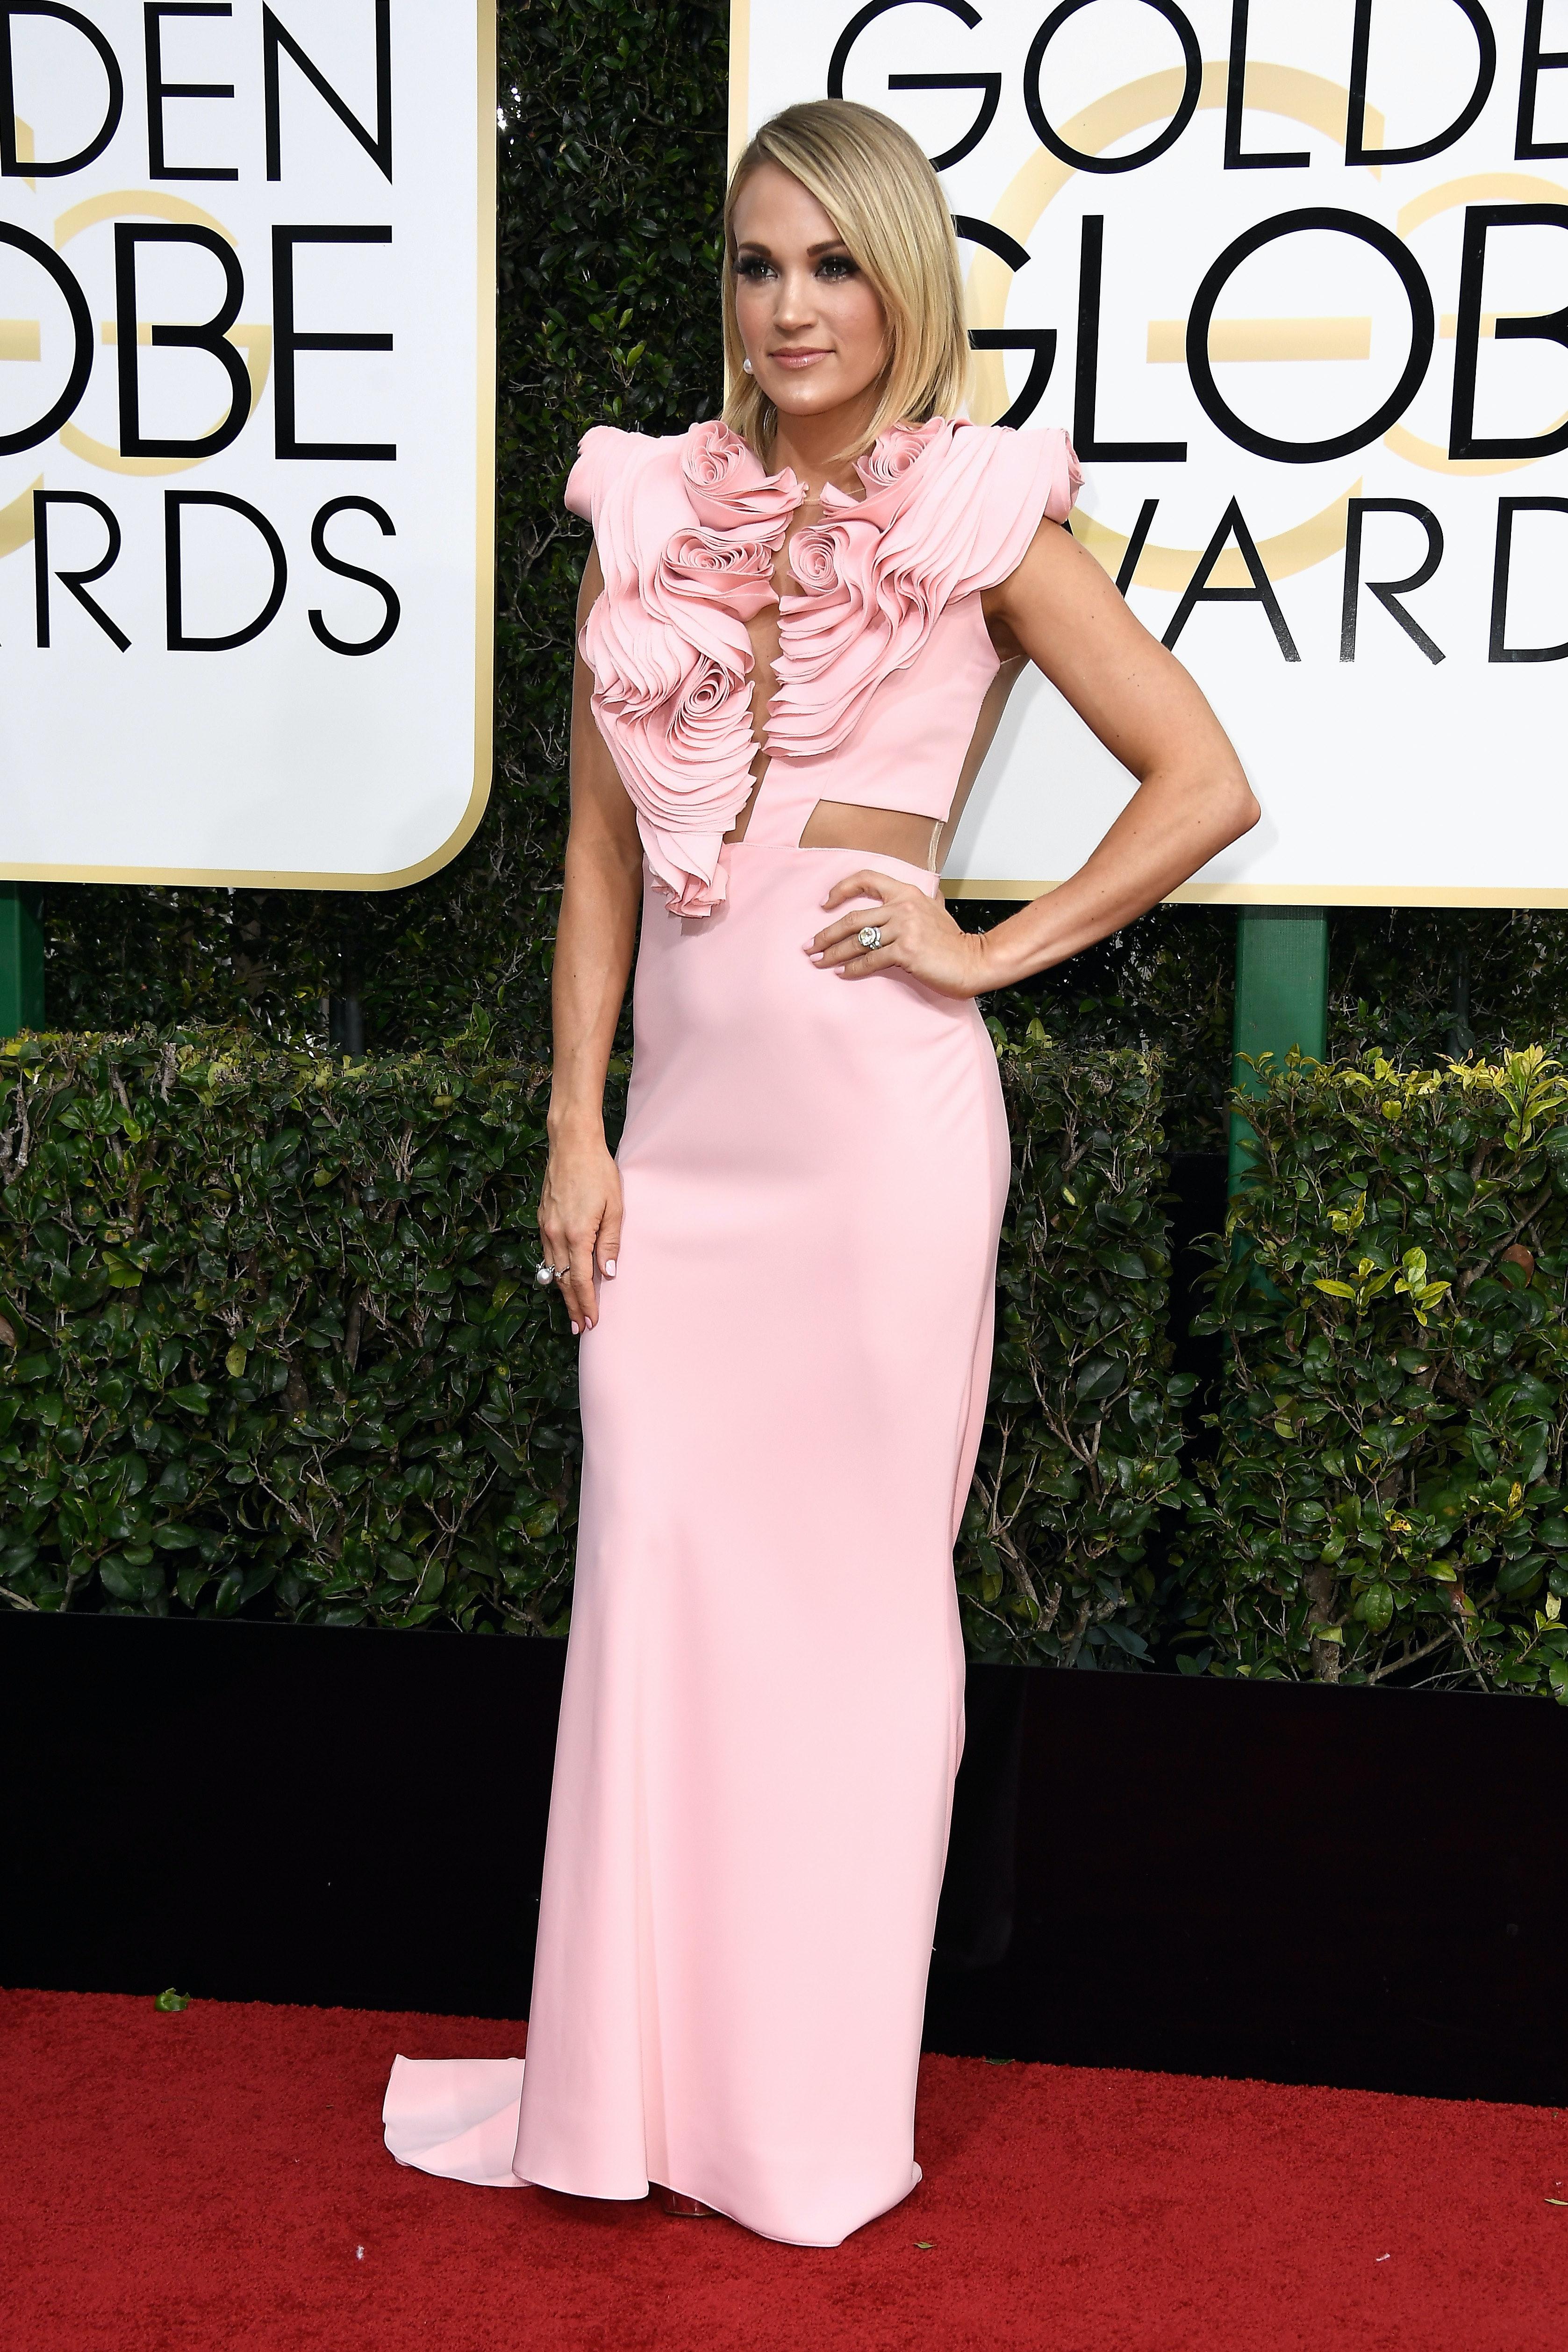 Carrie Underwood Dress